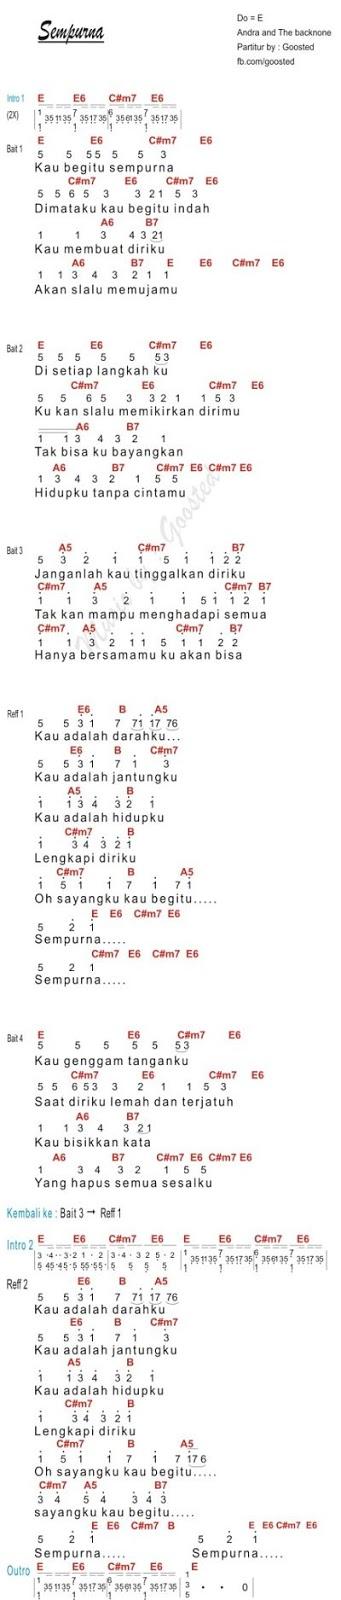 Andra And The Backbone Sempurna Chord : andra, backbone, sempurna, chord, Angka, Sempurna, Andra, Backbone, Cover, Gutawa, Notasi, Piano, Pianika